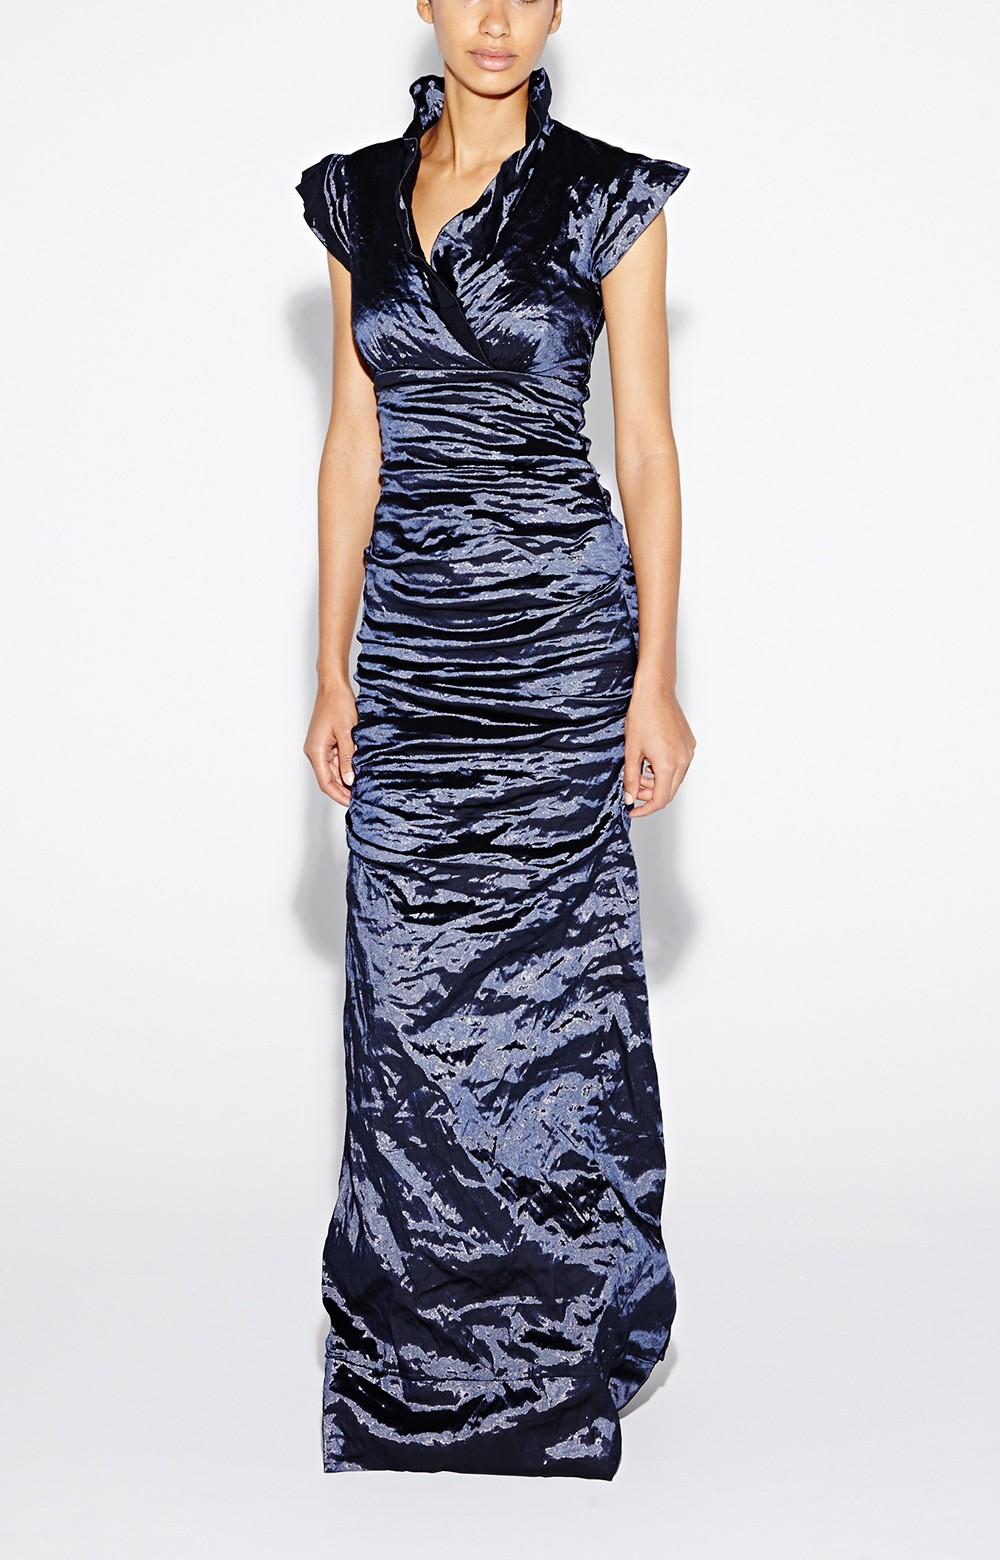 Lyst - Nicole Miller Astor Techno Metal Gown in Blue 596593f04